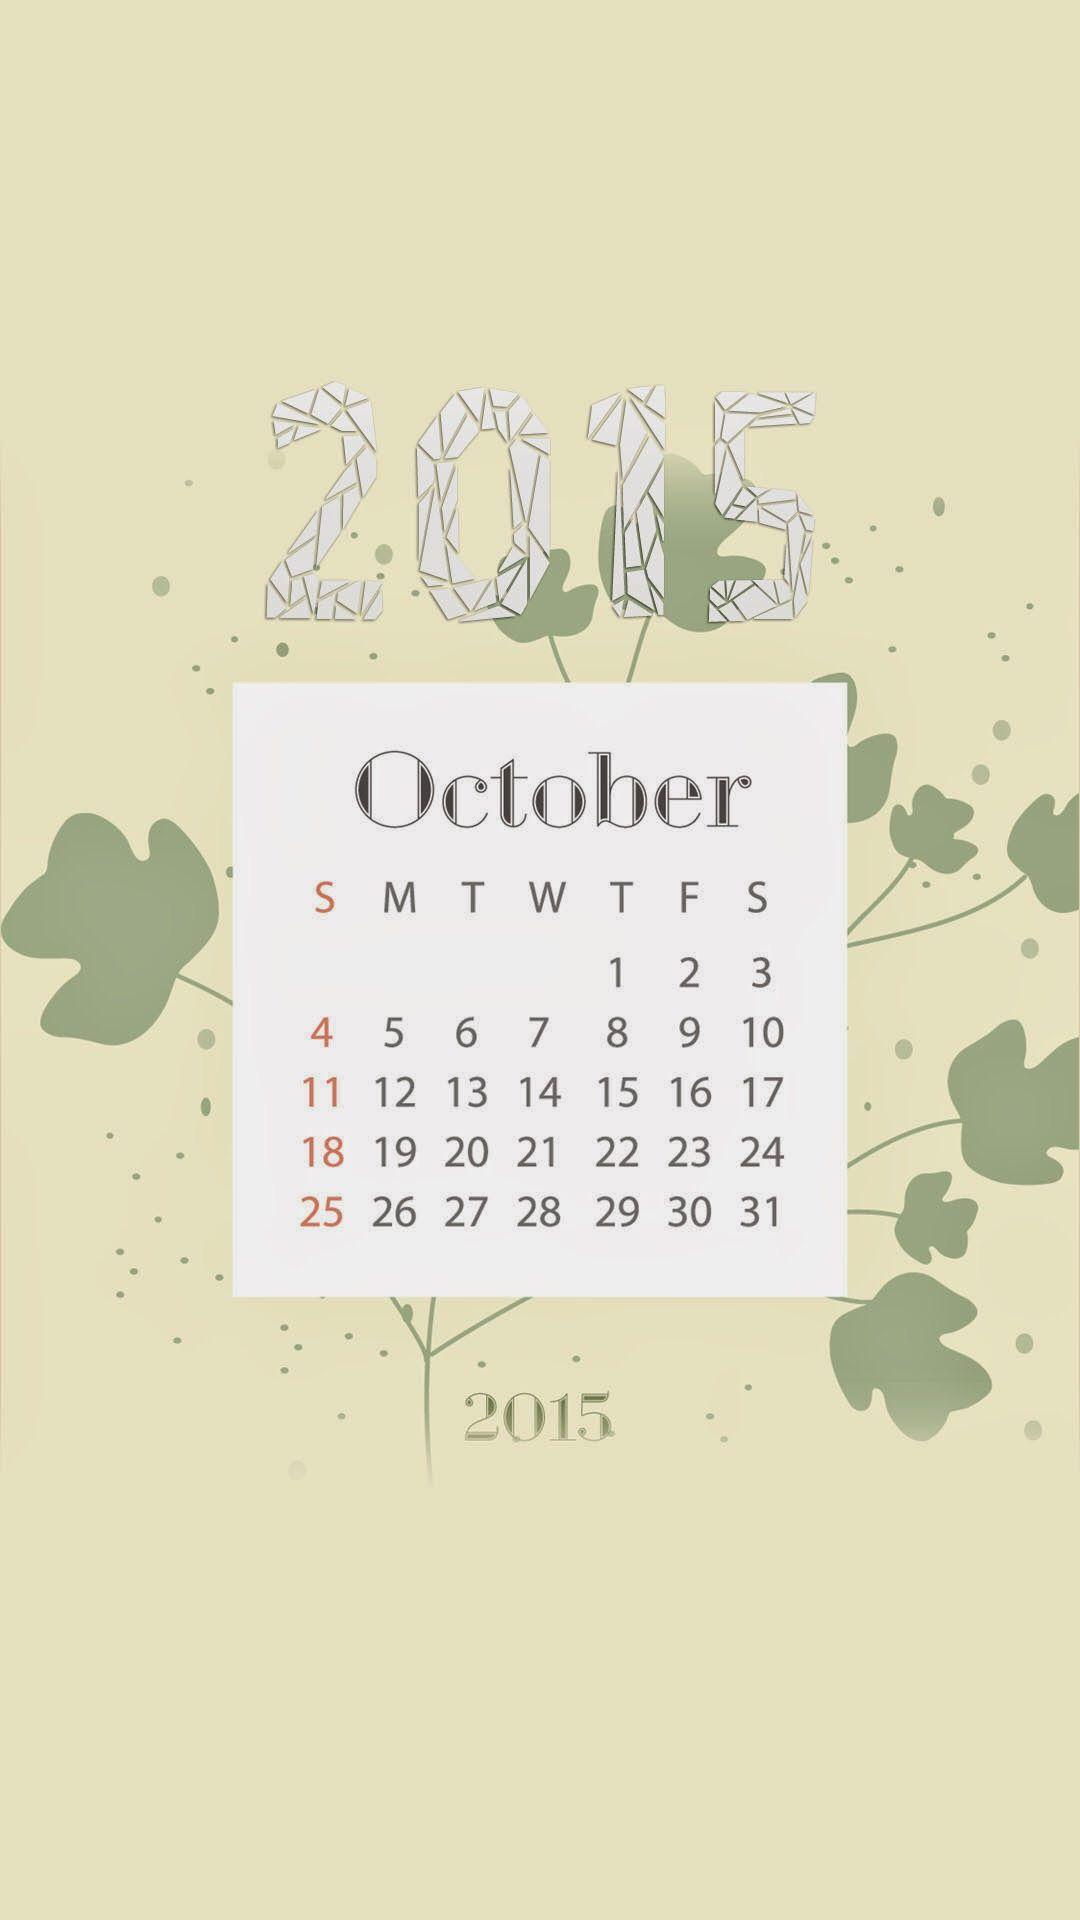 October Calendar Wallpaper Iphone : October wallpaper of calendar wallpapers collection